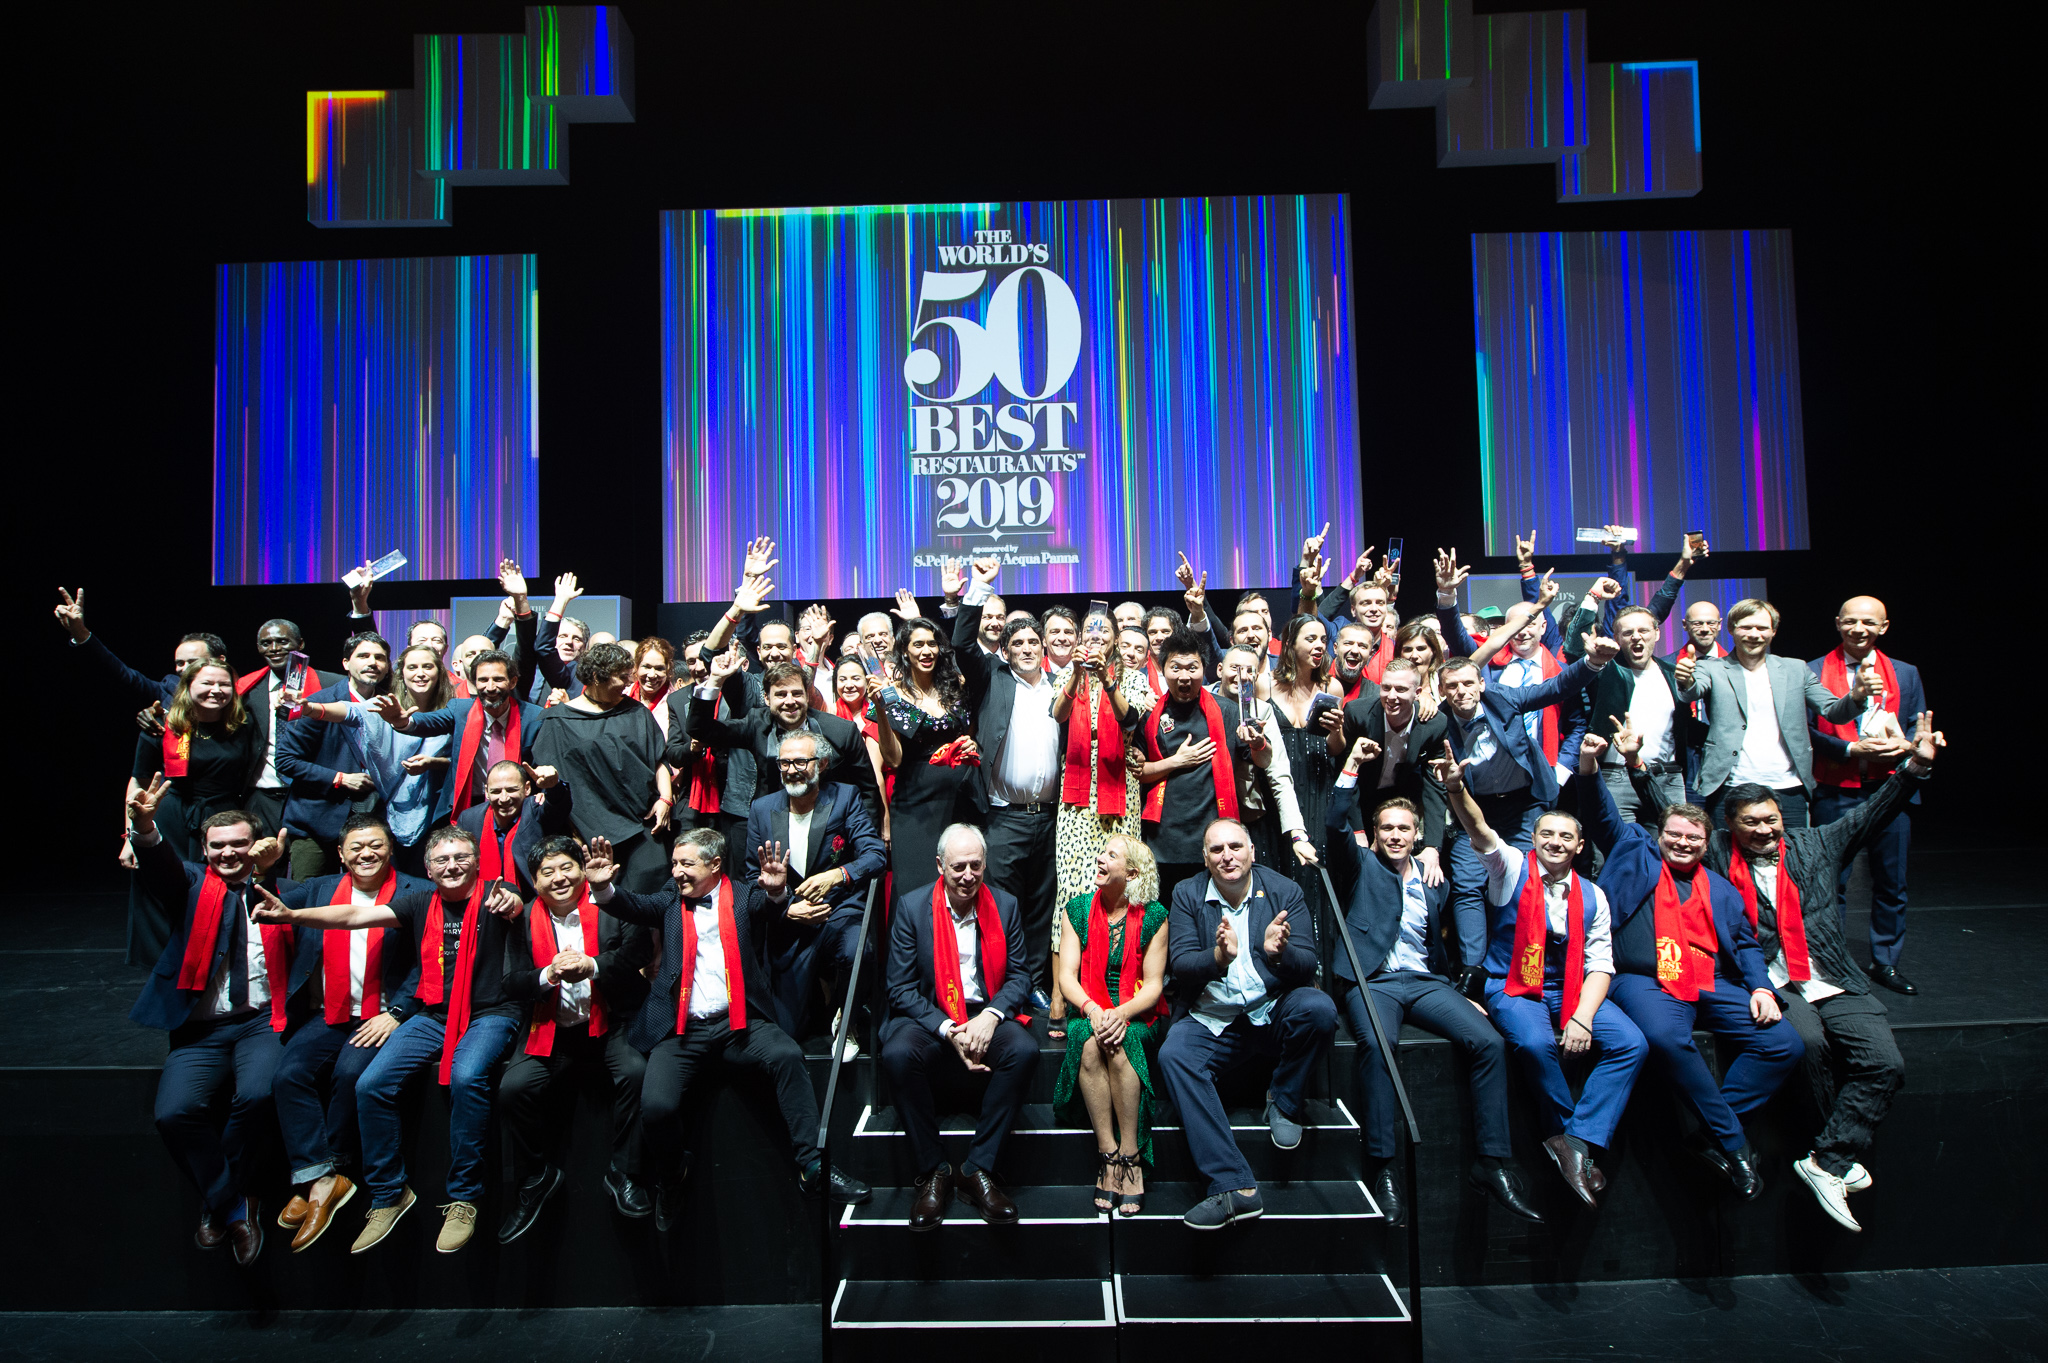 Alain Passard, winner of 2019 Chefs' Choice award, sponsored by Estrella Damm - 2.jpg